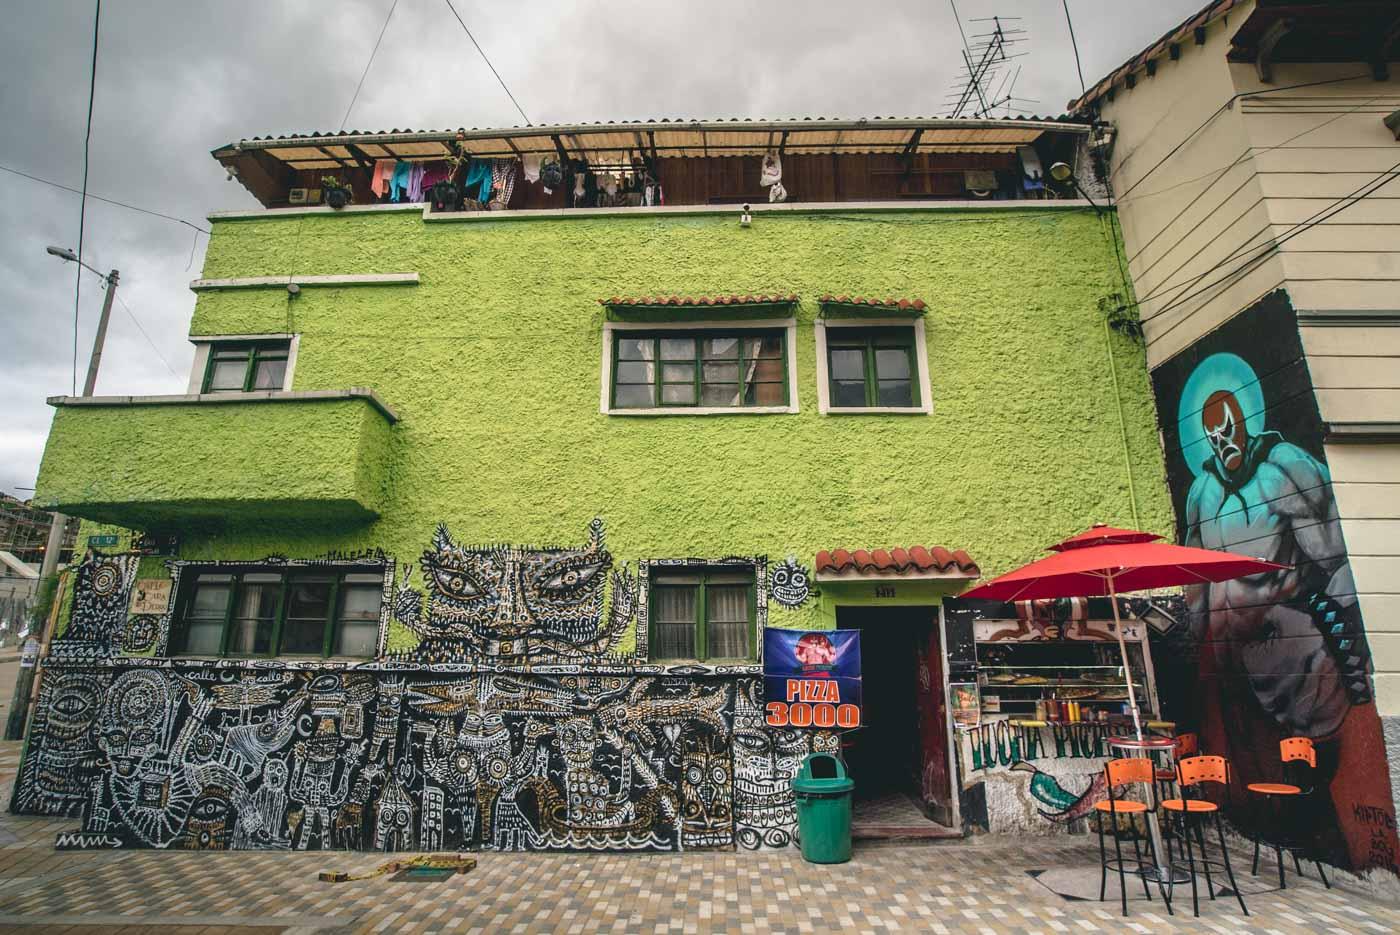 Amazing graffiti art is plentiful in Bogota!